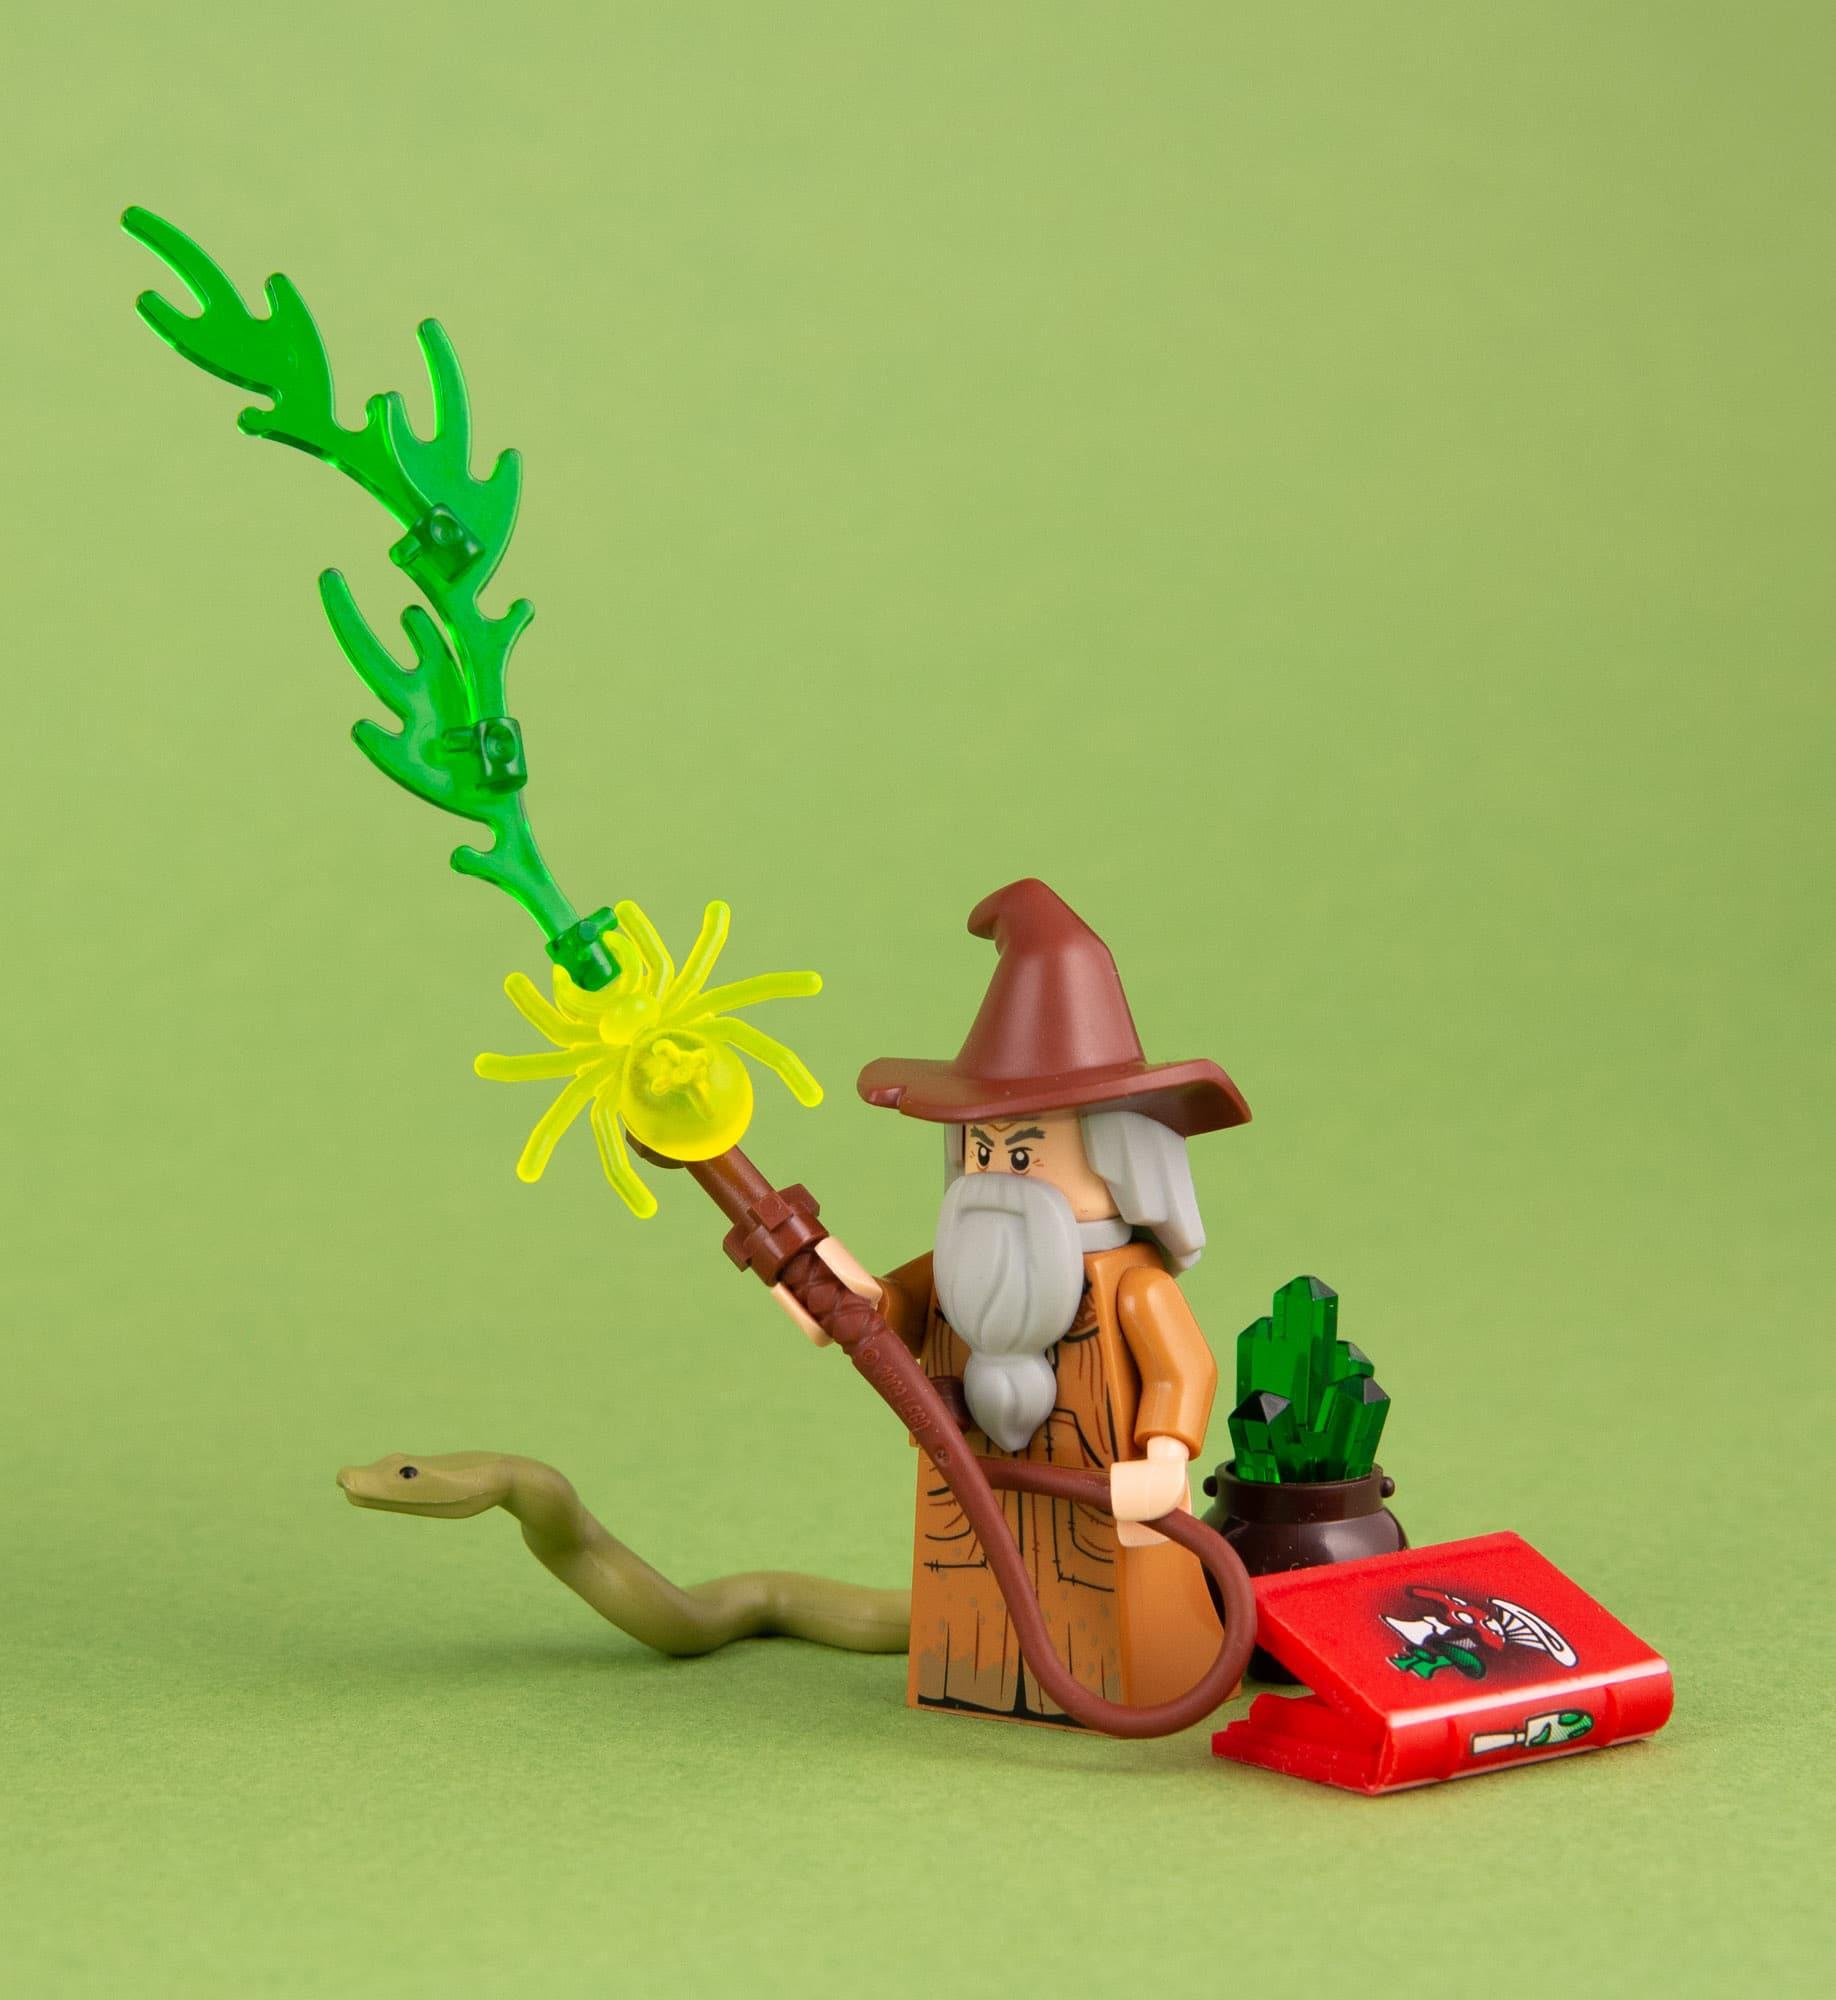 LEGO Waechter Des Waldes